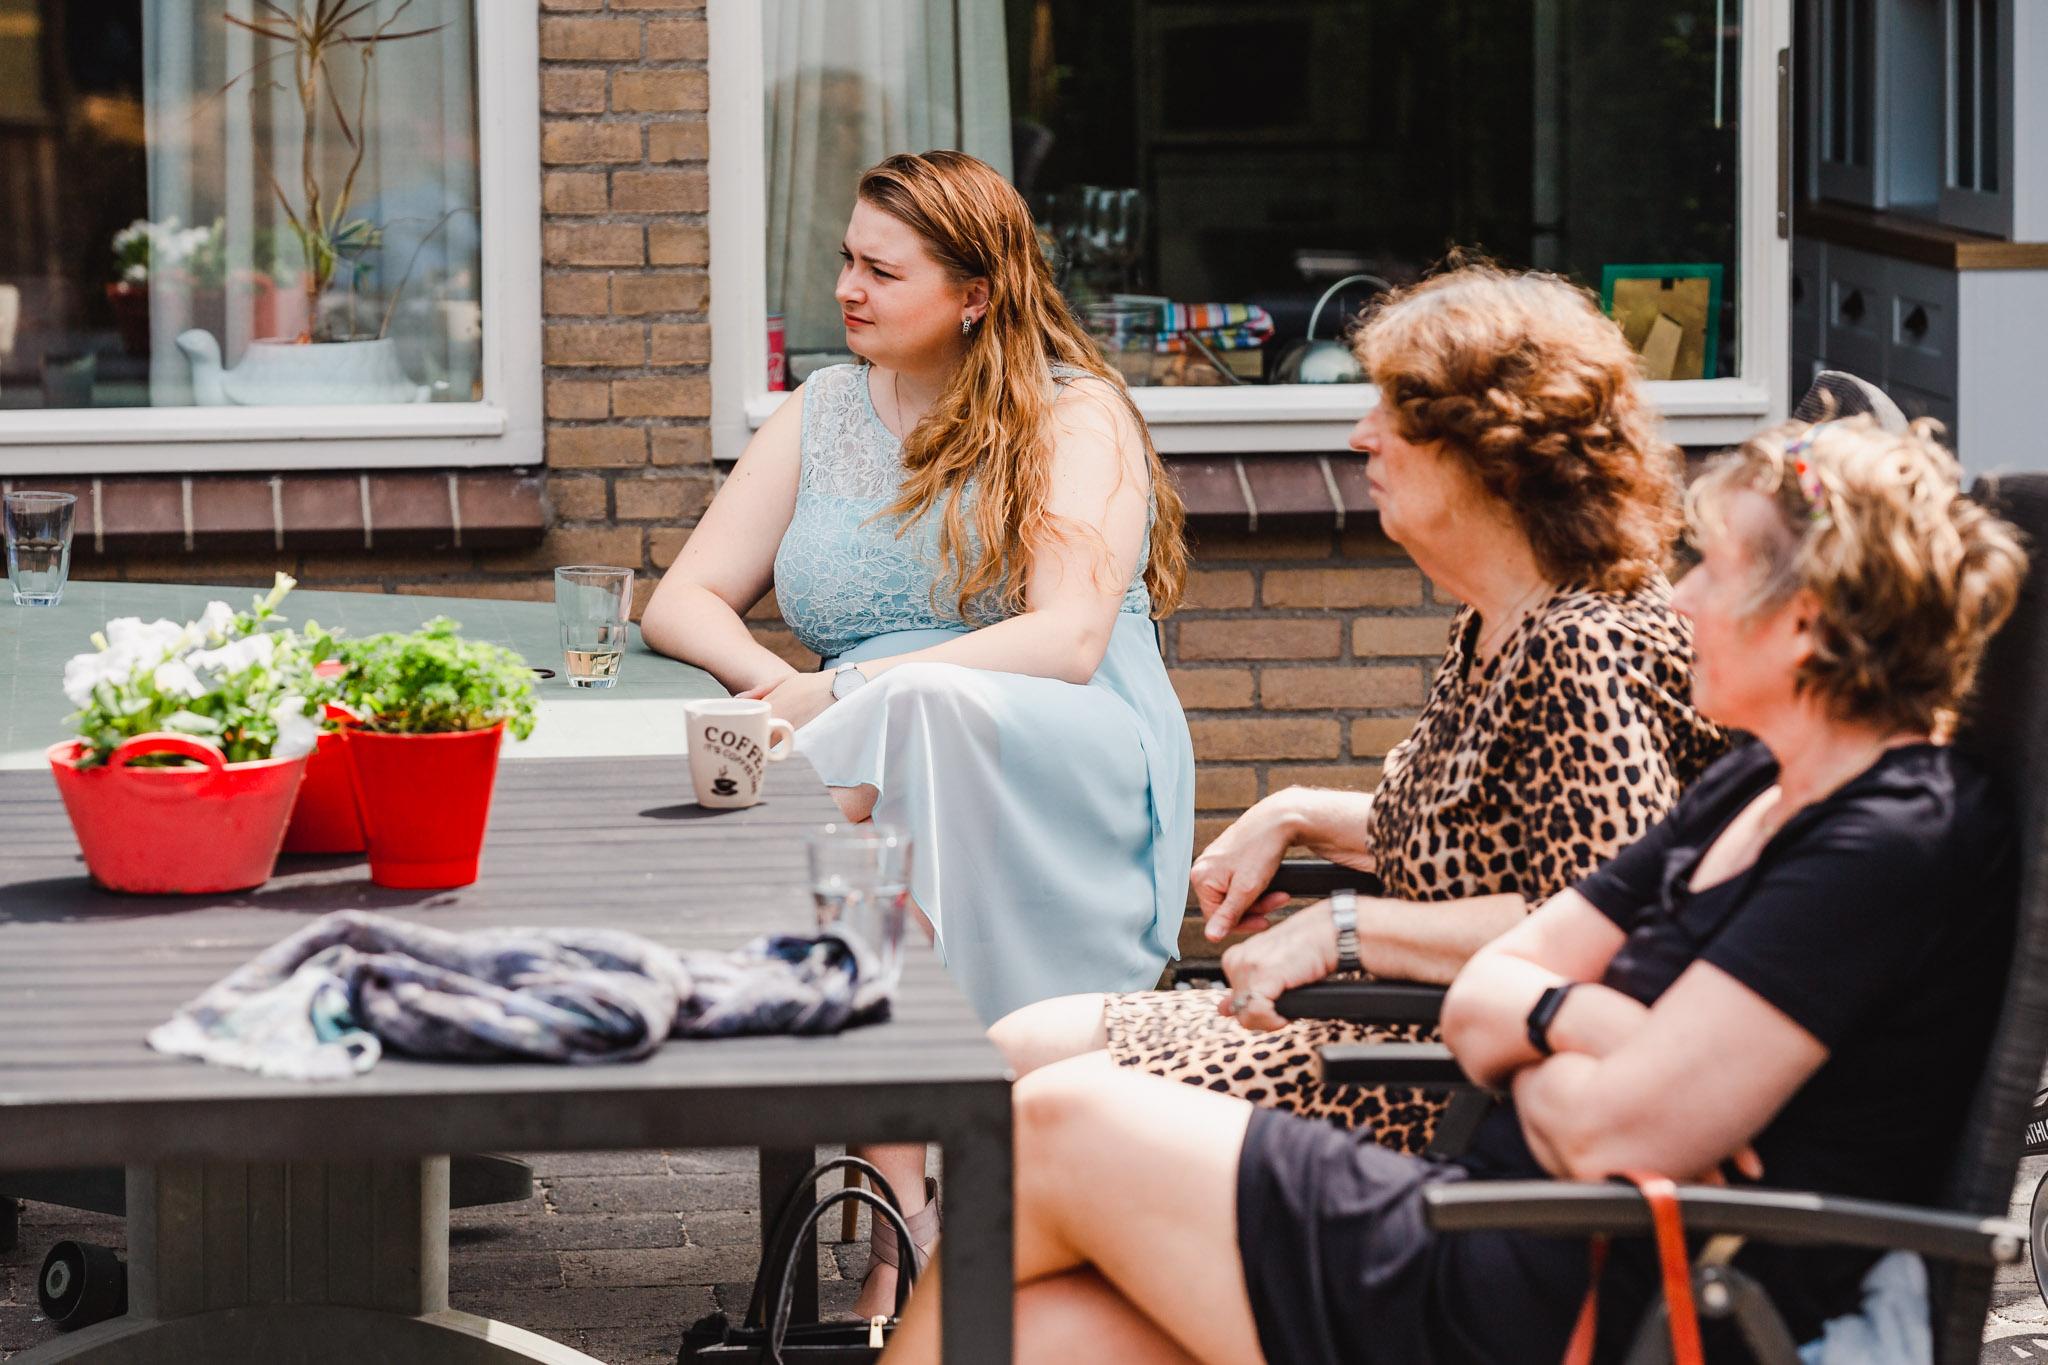 Bruiloft Reportage Geregistreerd Partnerschap Flevoland Lelystad Shot By Sylla 4